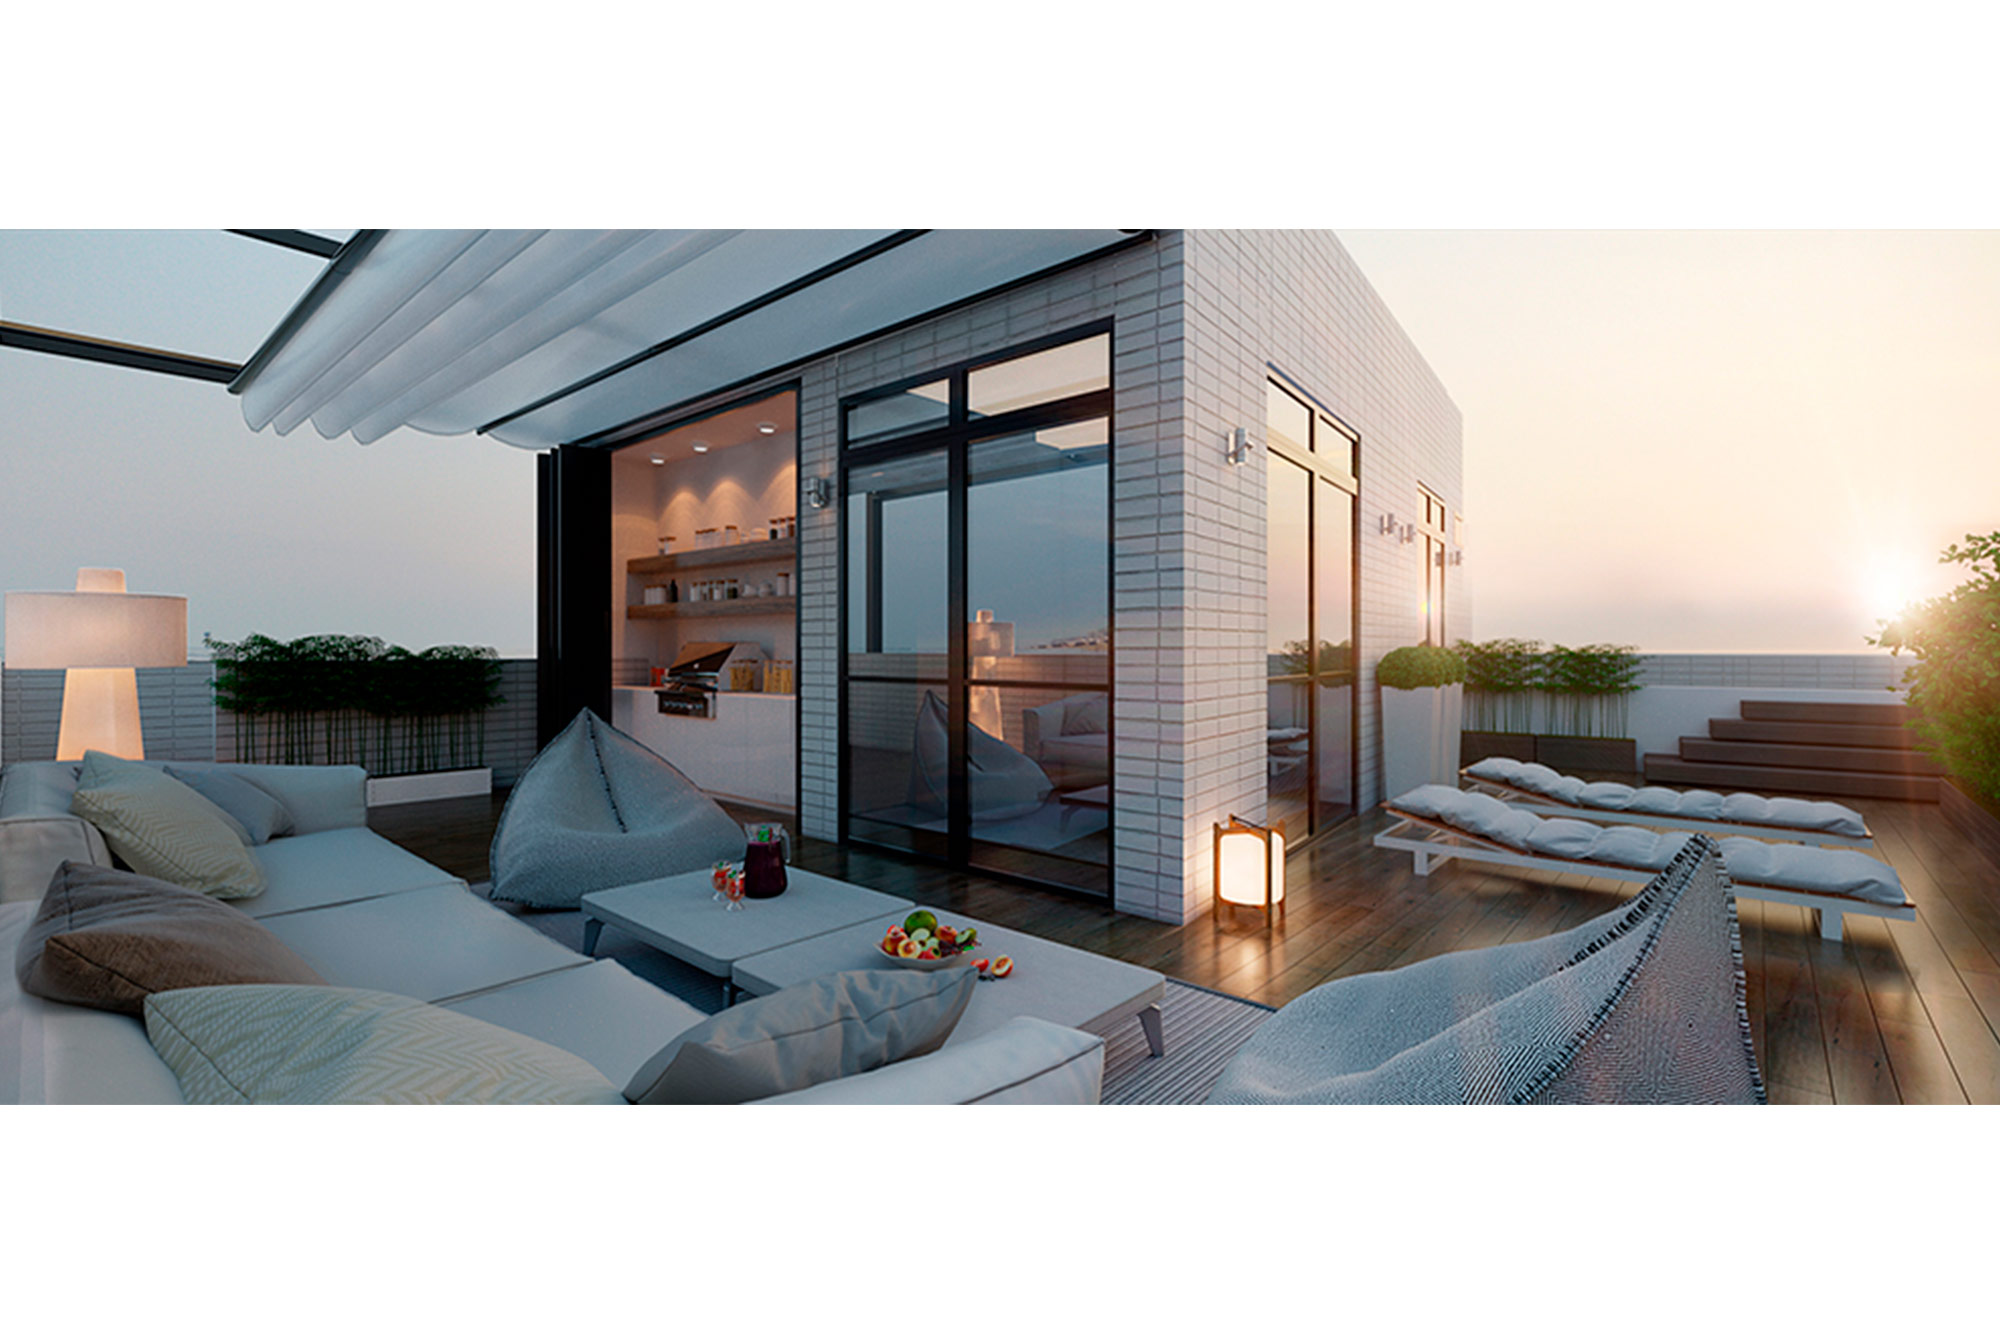 Edificio-Casino_-Adra_-Arquitectura-_-EXarchitects_06